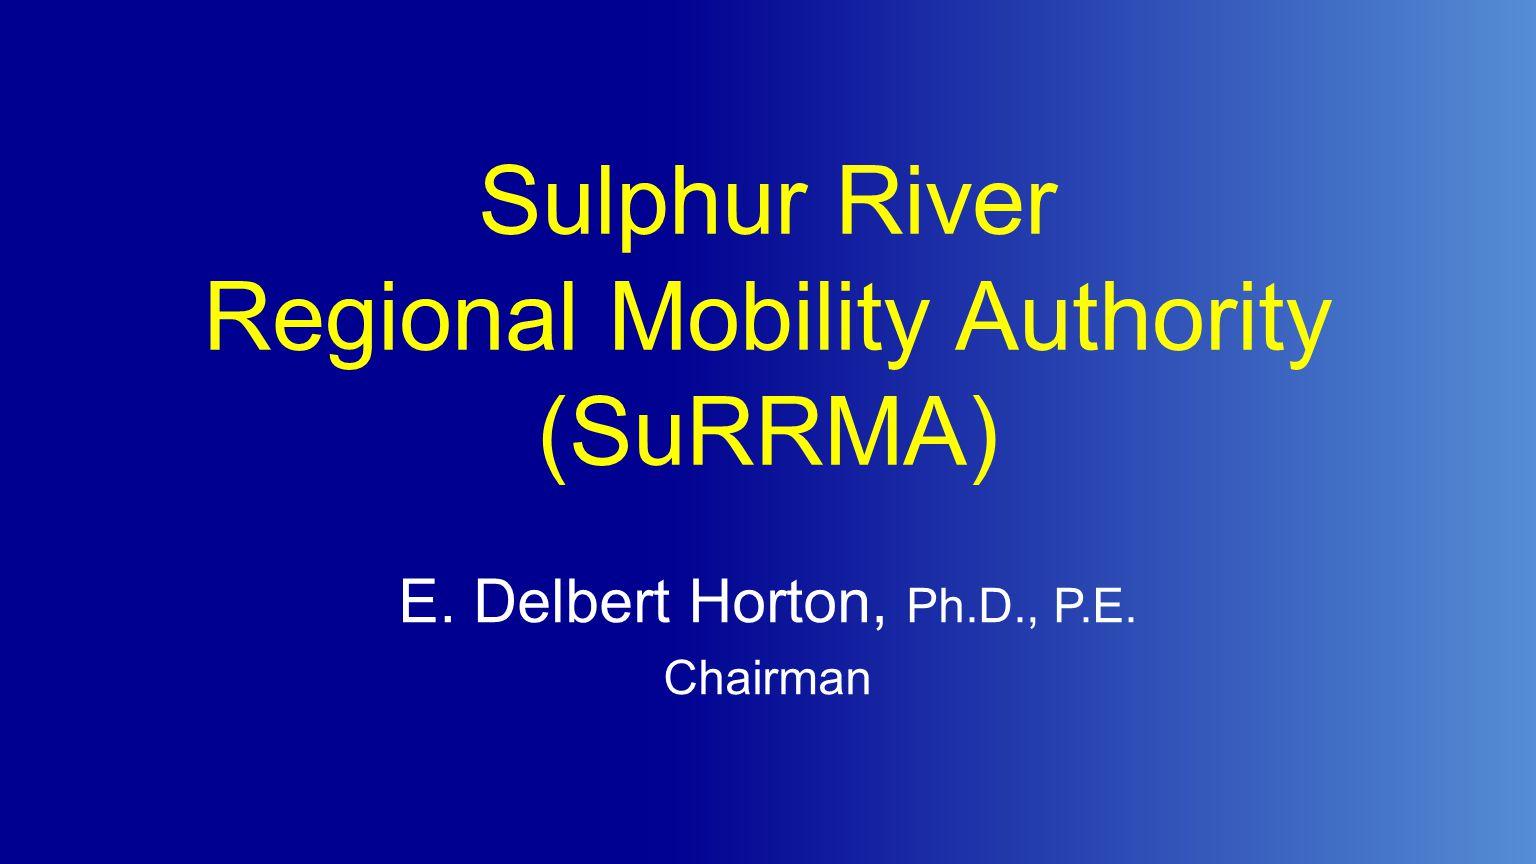 Sulphur River Regional Mobility Authority (SuRRMA) E. Delbert Horton, Ph.D., P.E. Chairman